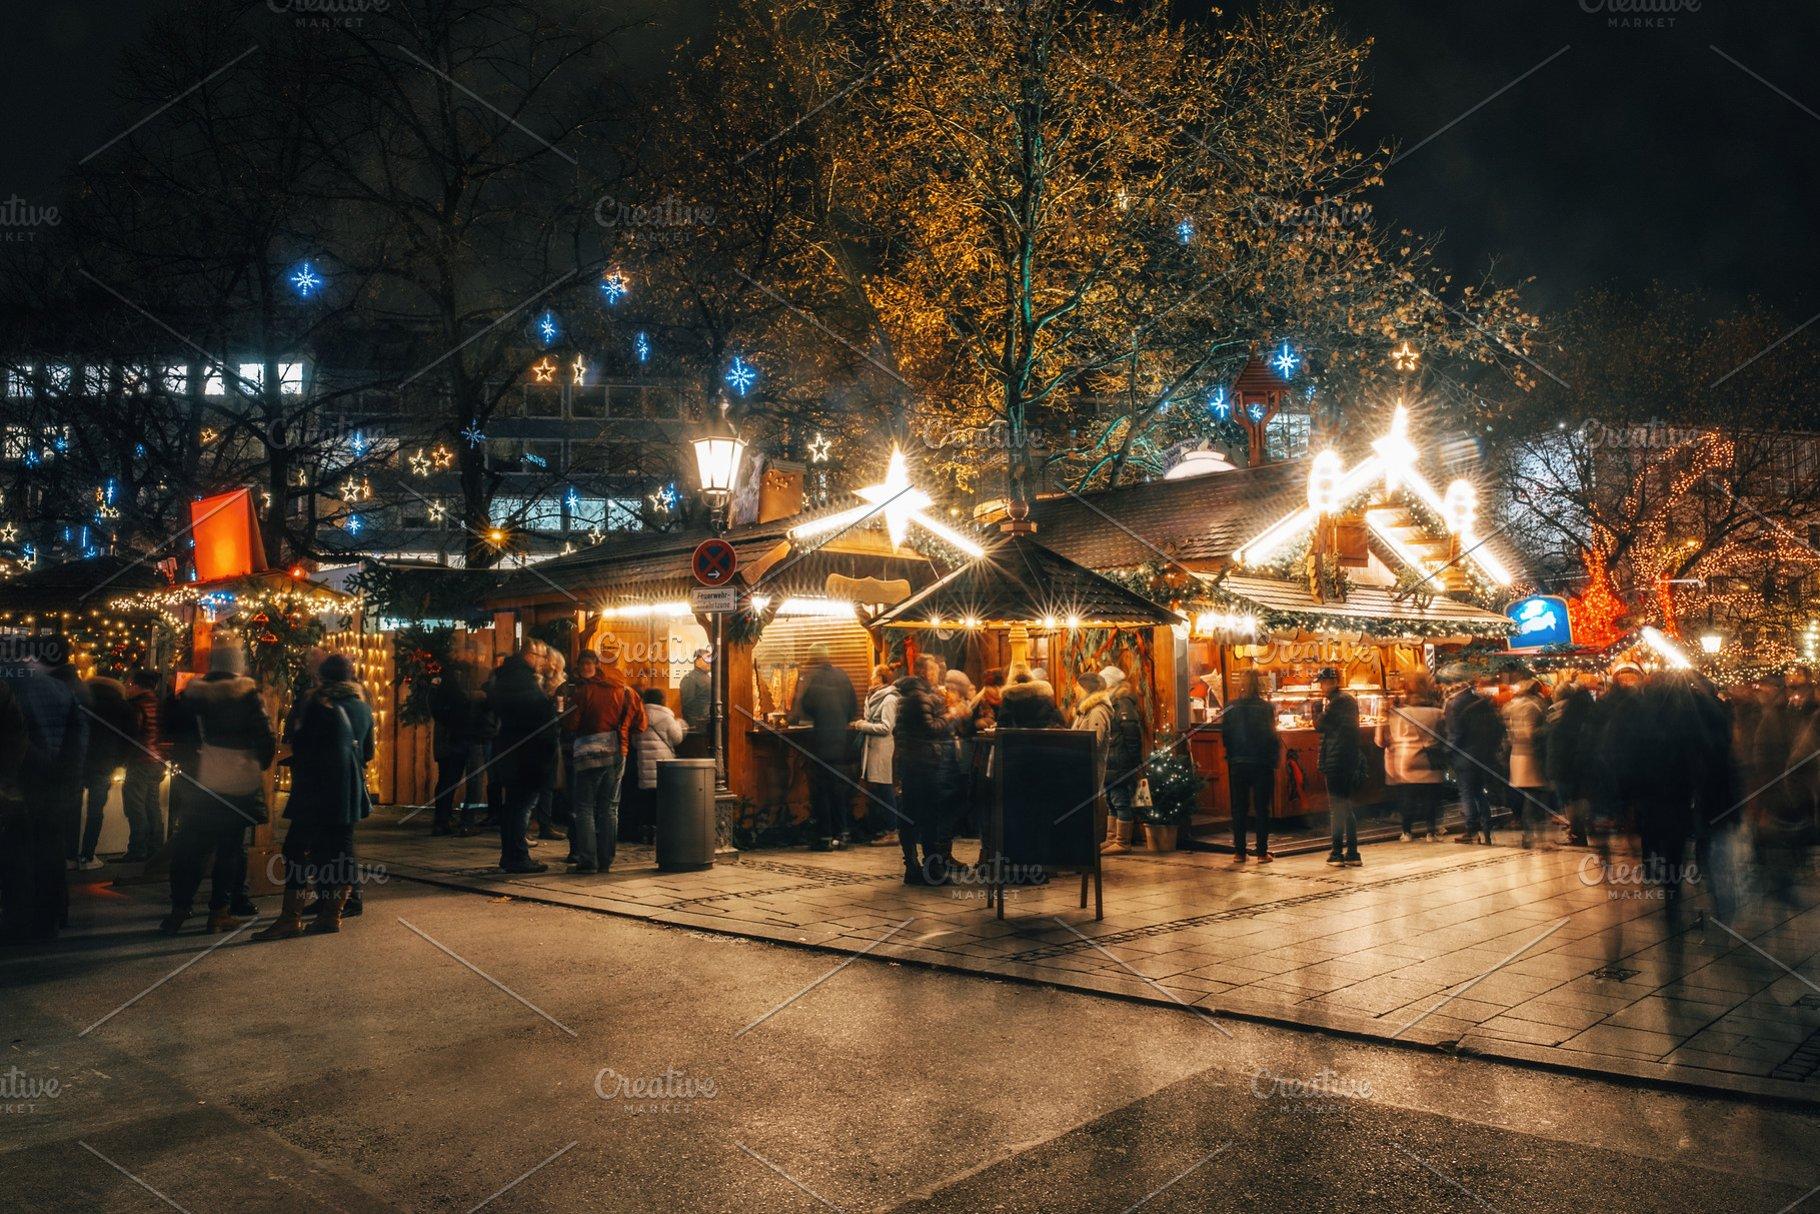 Christmas In Munich Germany.Christmas Market In Munich Germany